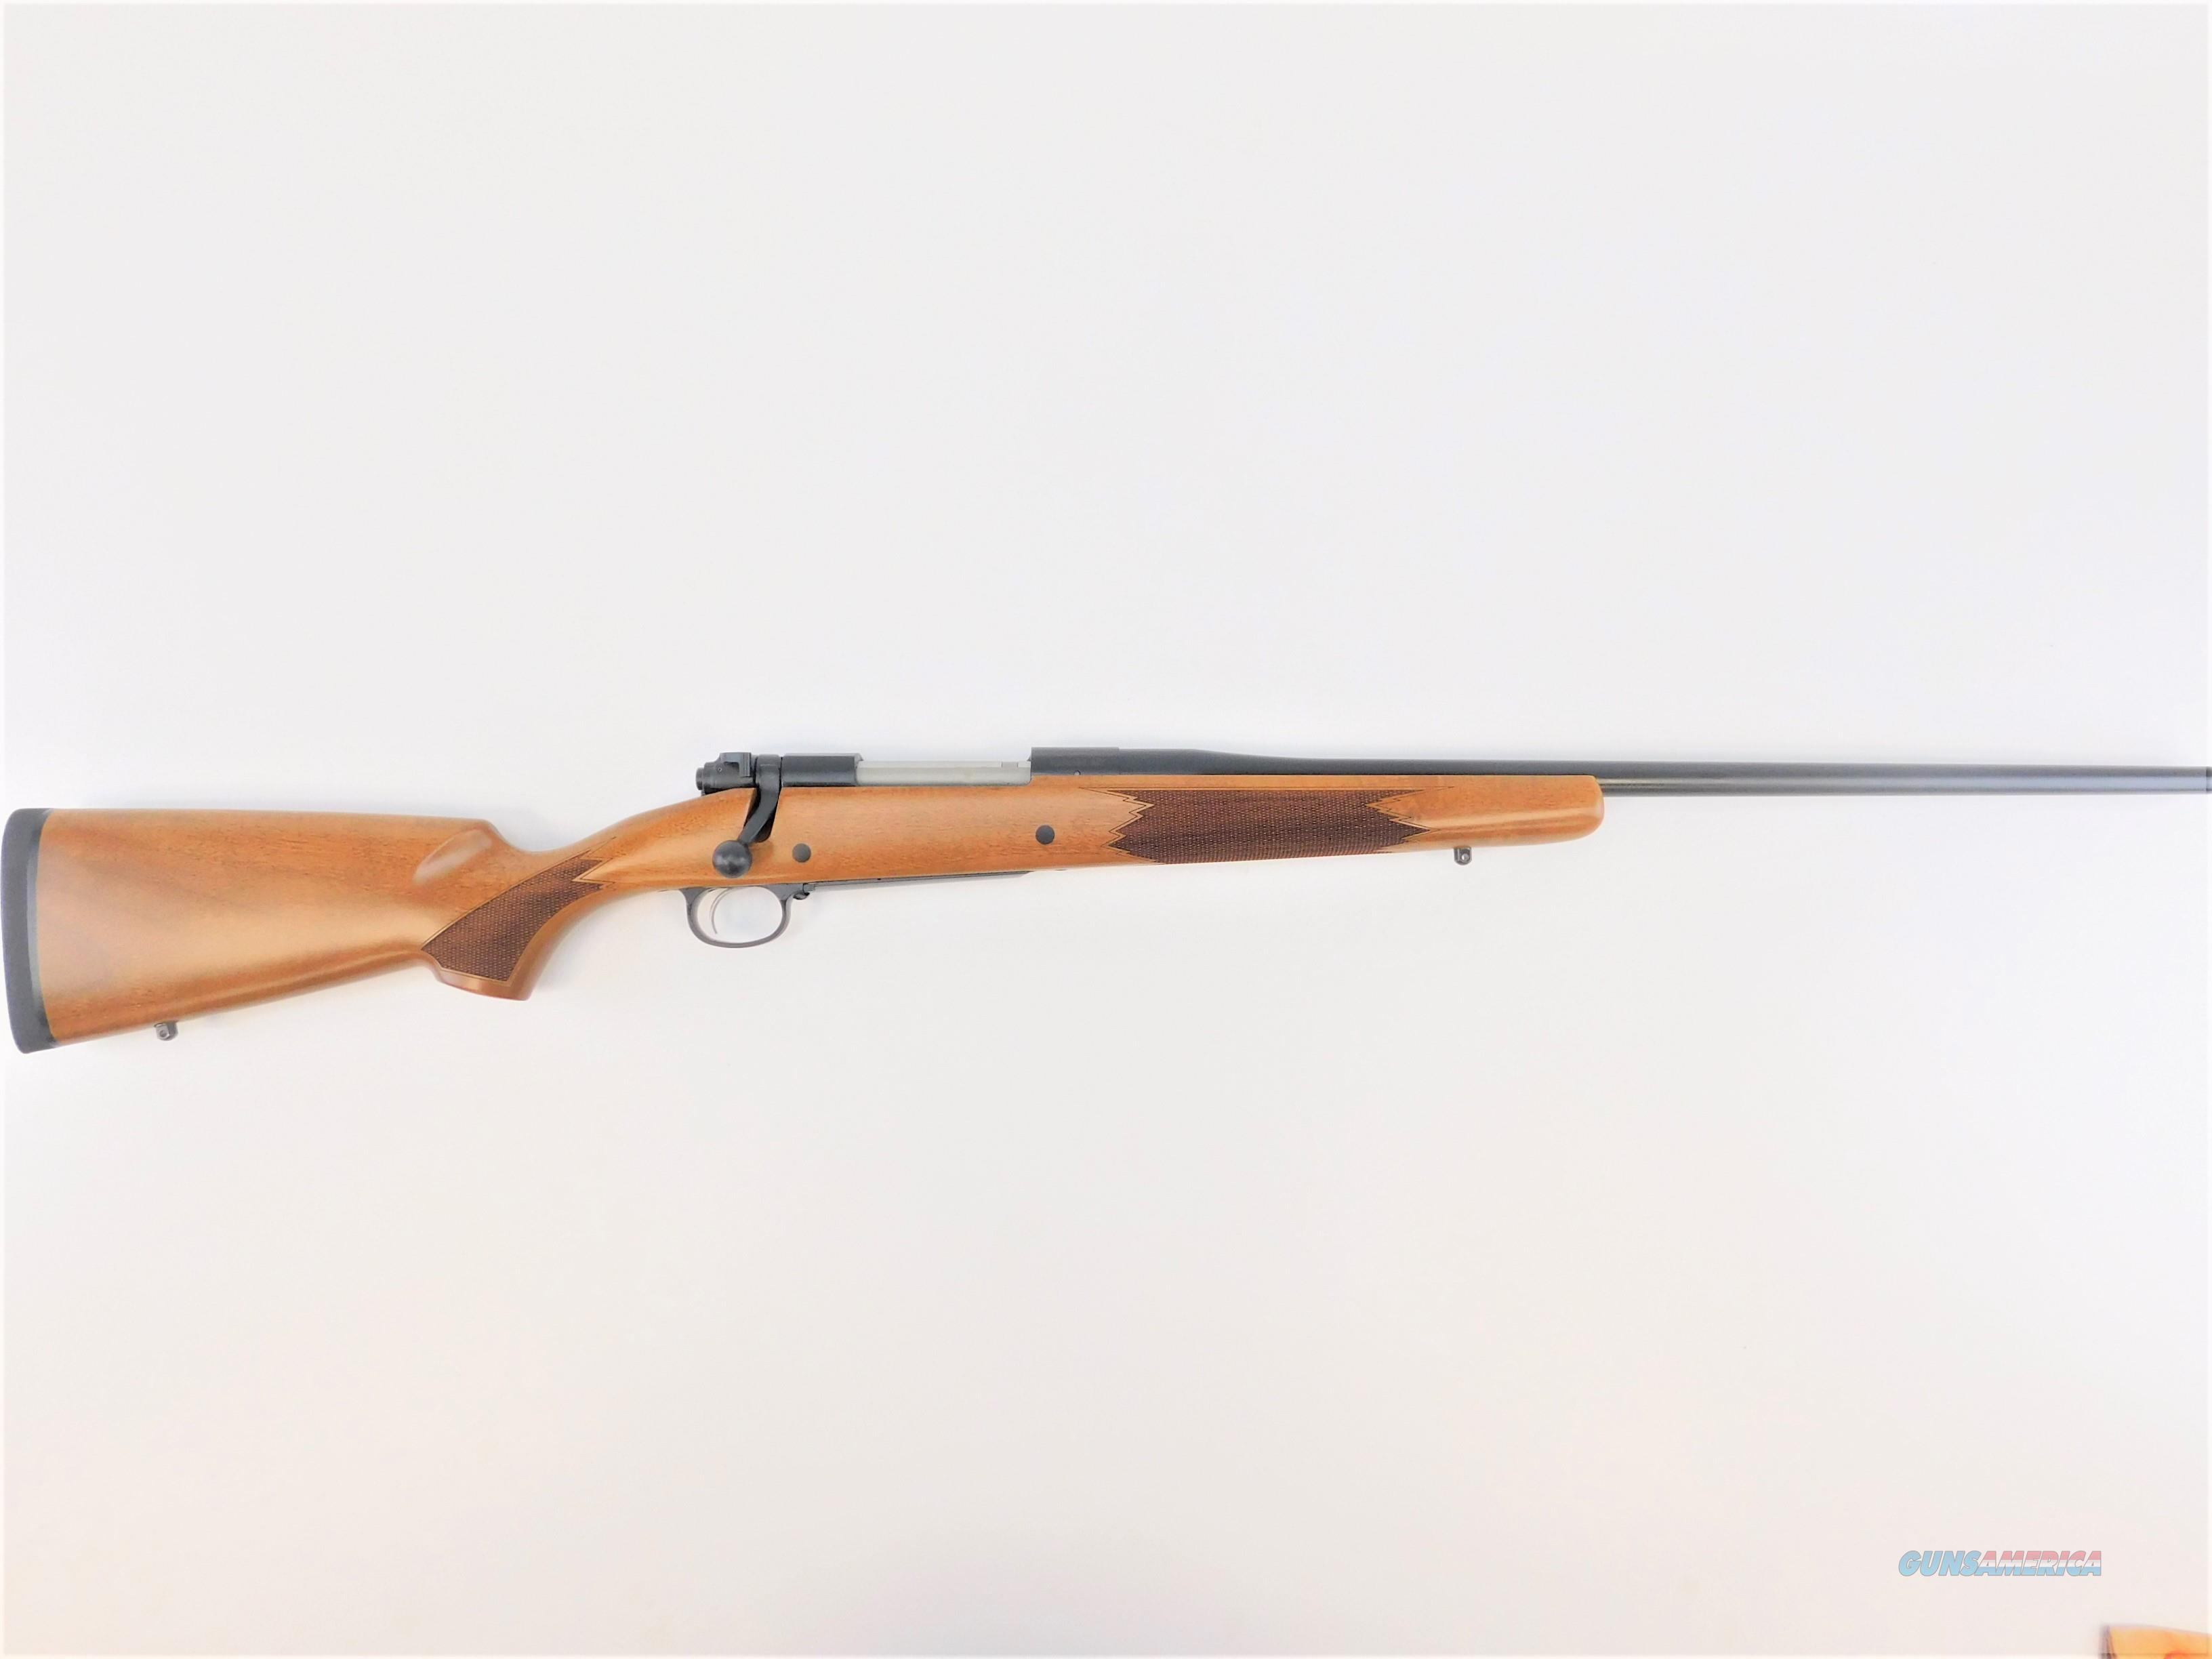 "Montana Rifle Co. American Standard ASR .300 Win Mag 24"" Turkish Walnut  Guns > Rifles > Montana Rifle Company Rifles"